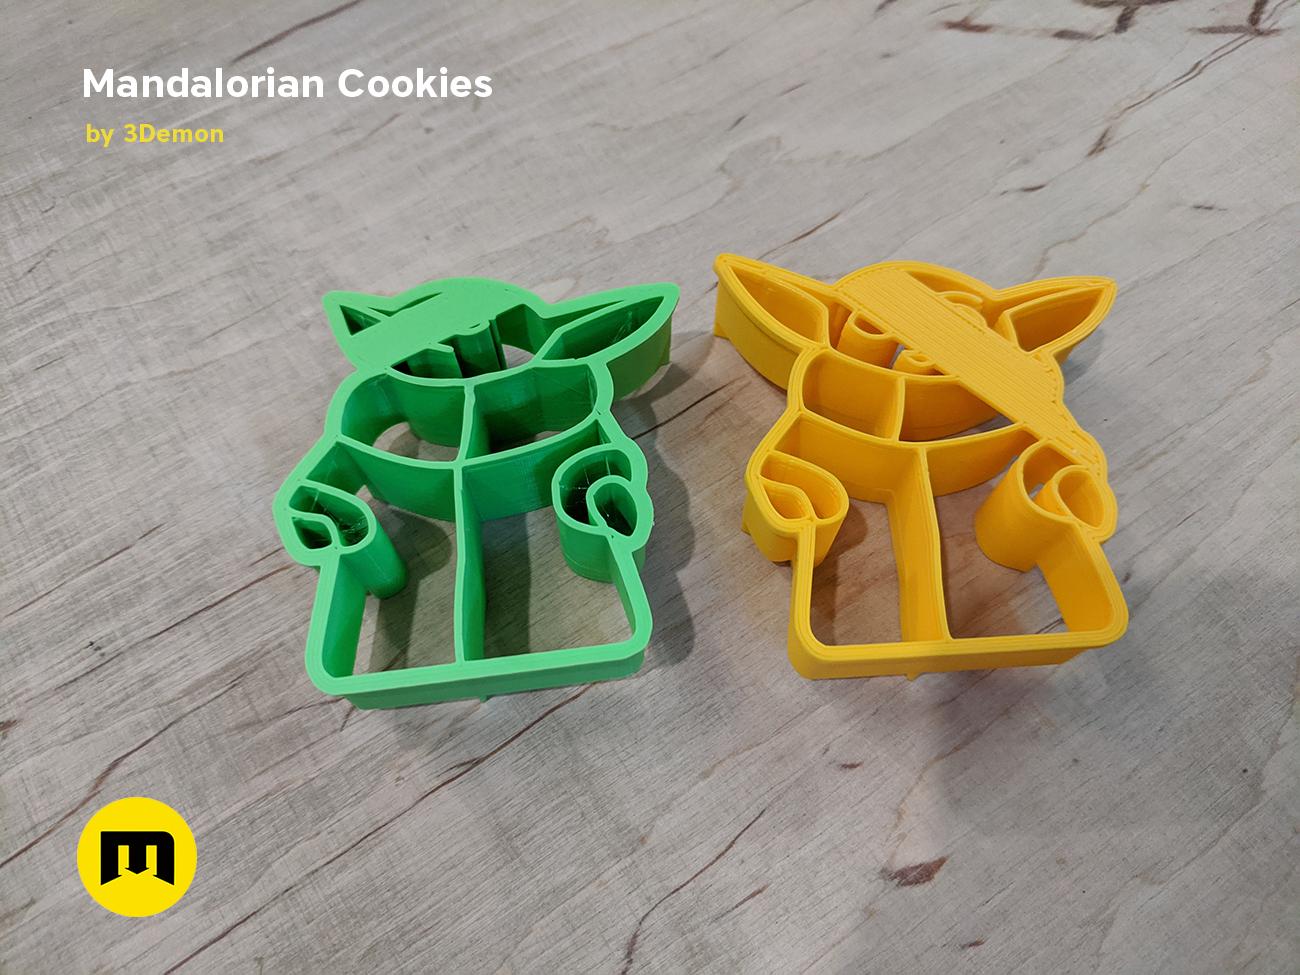 IMG_20191206_153306.png Download STL file Yoda Baby Cookie Cutter Mandalorian • 3D printer design, 3D-mon